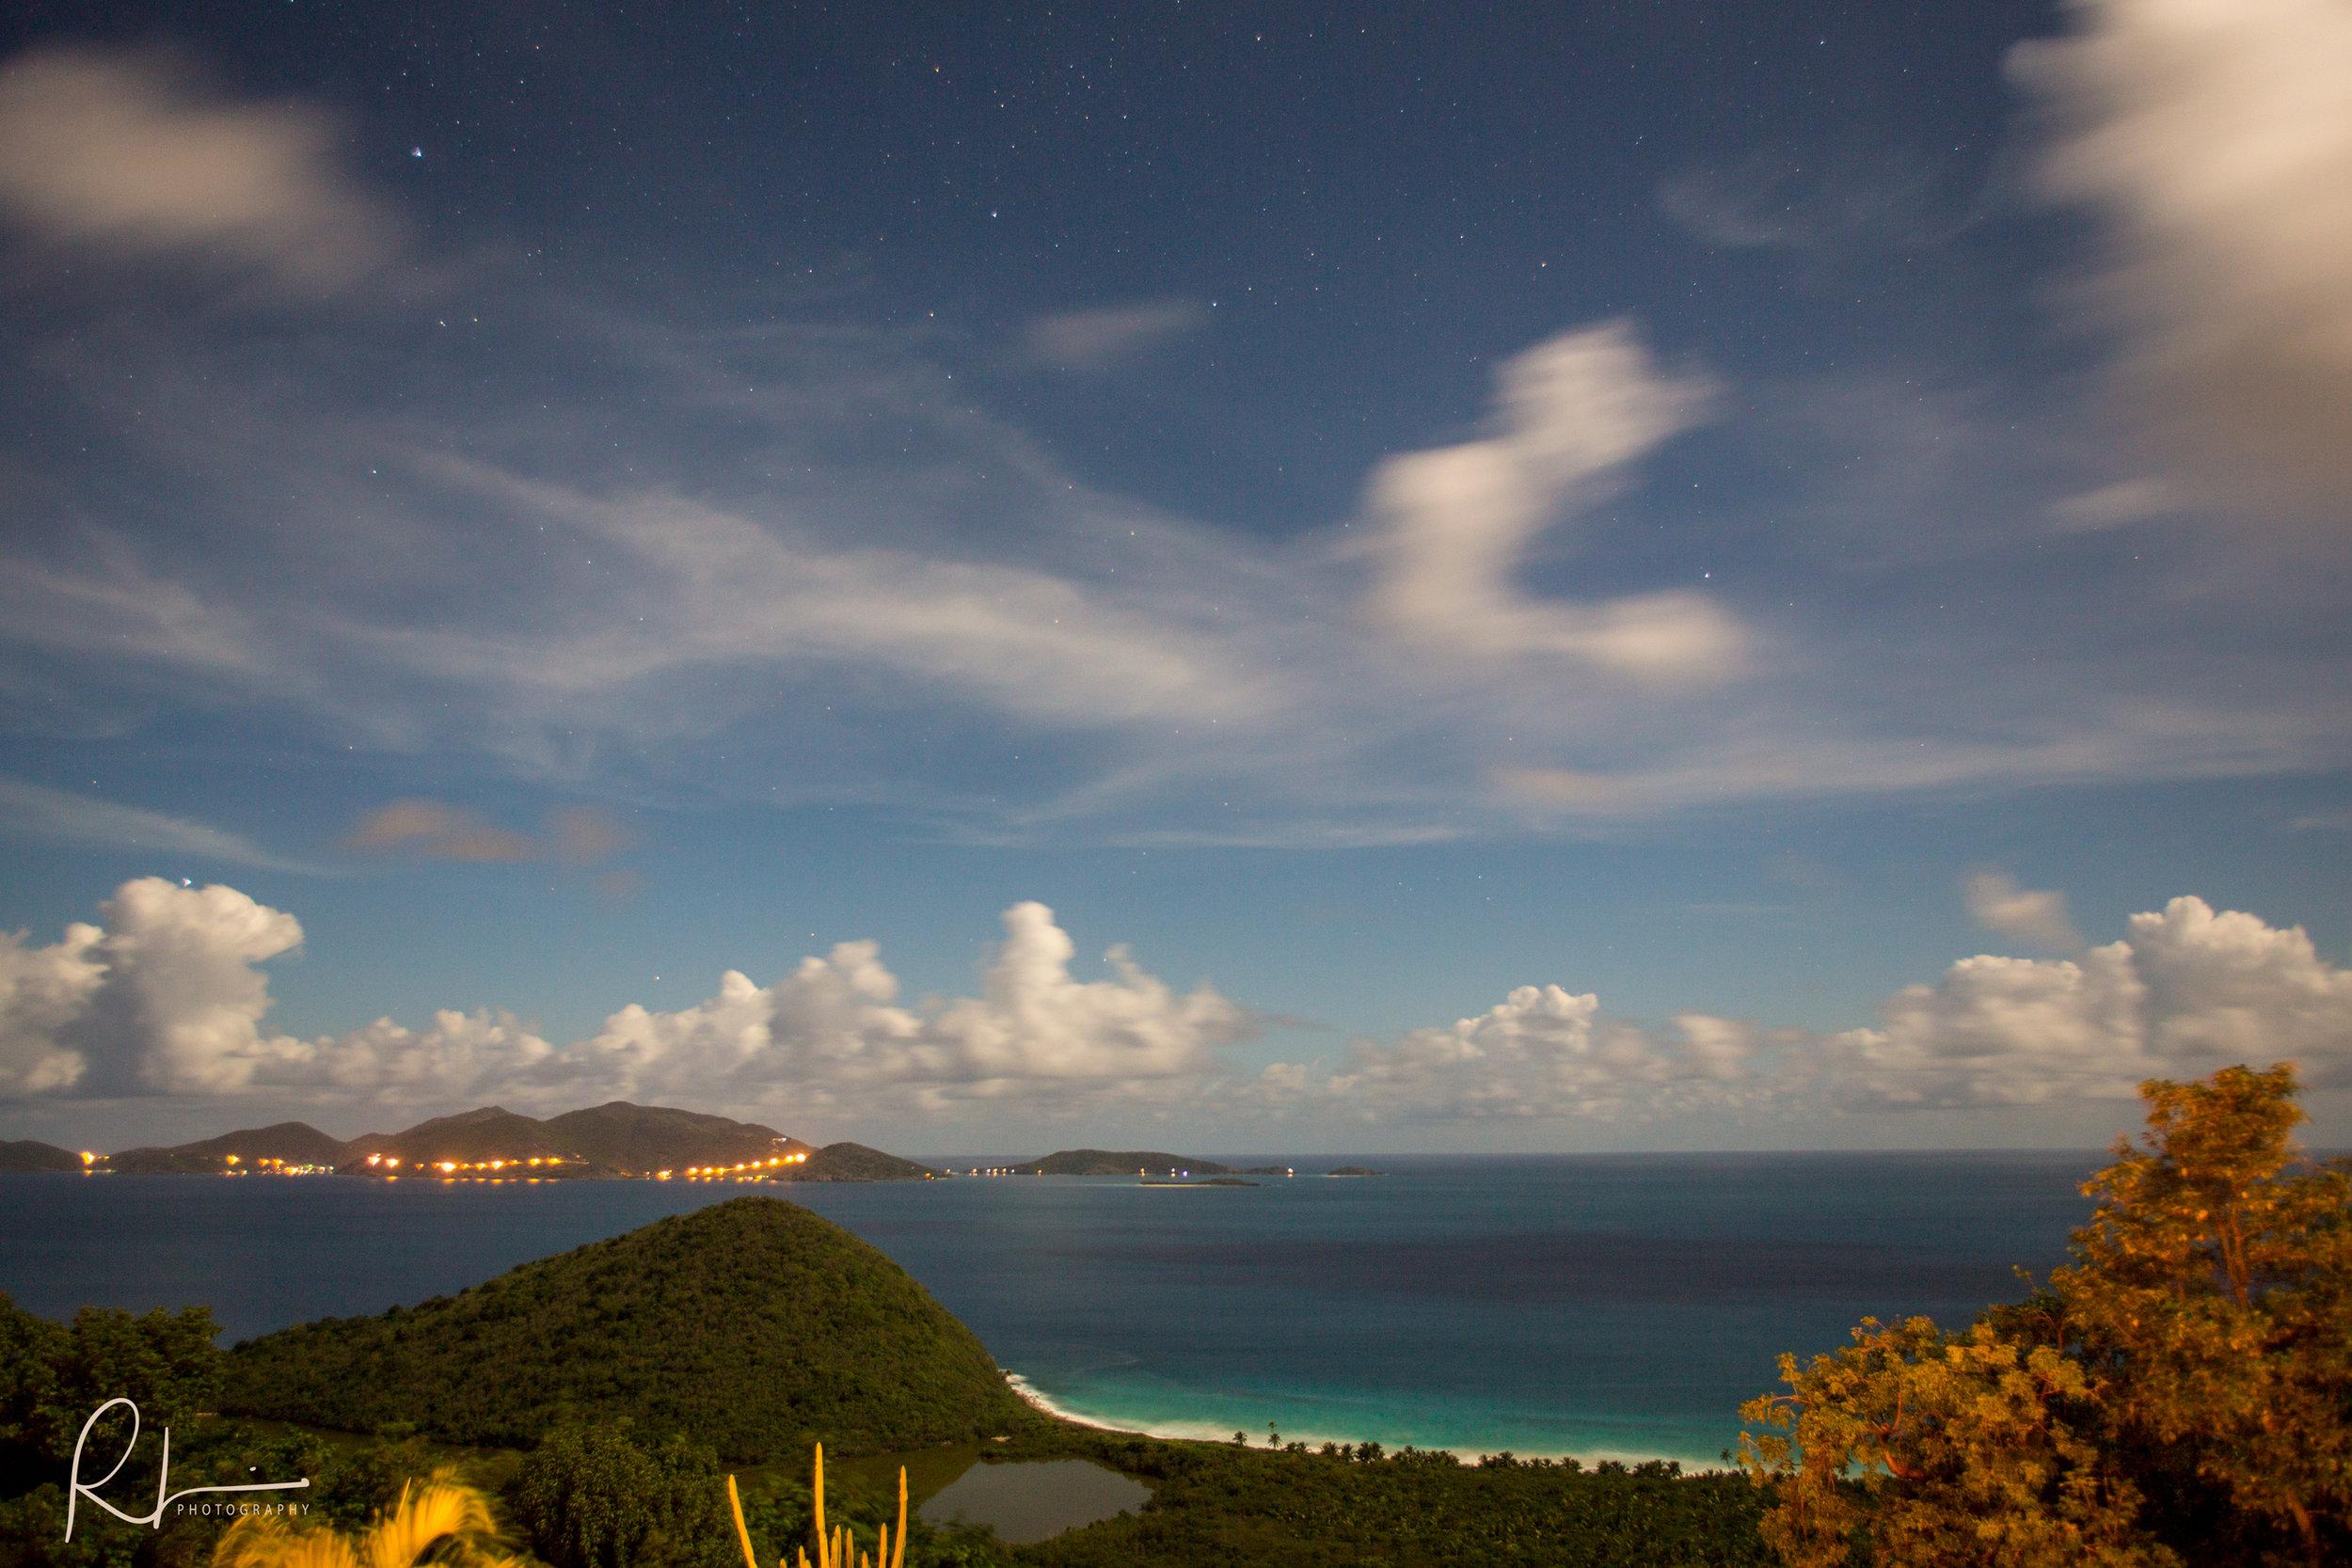 Night photography in Tortola